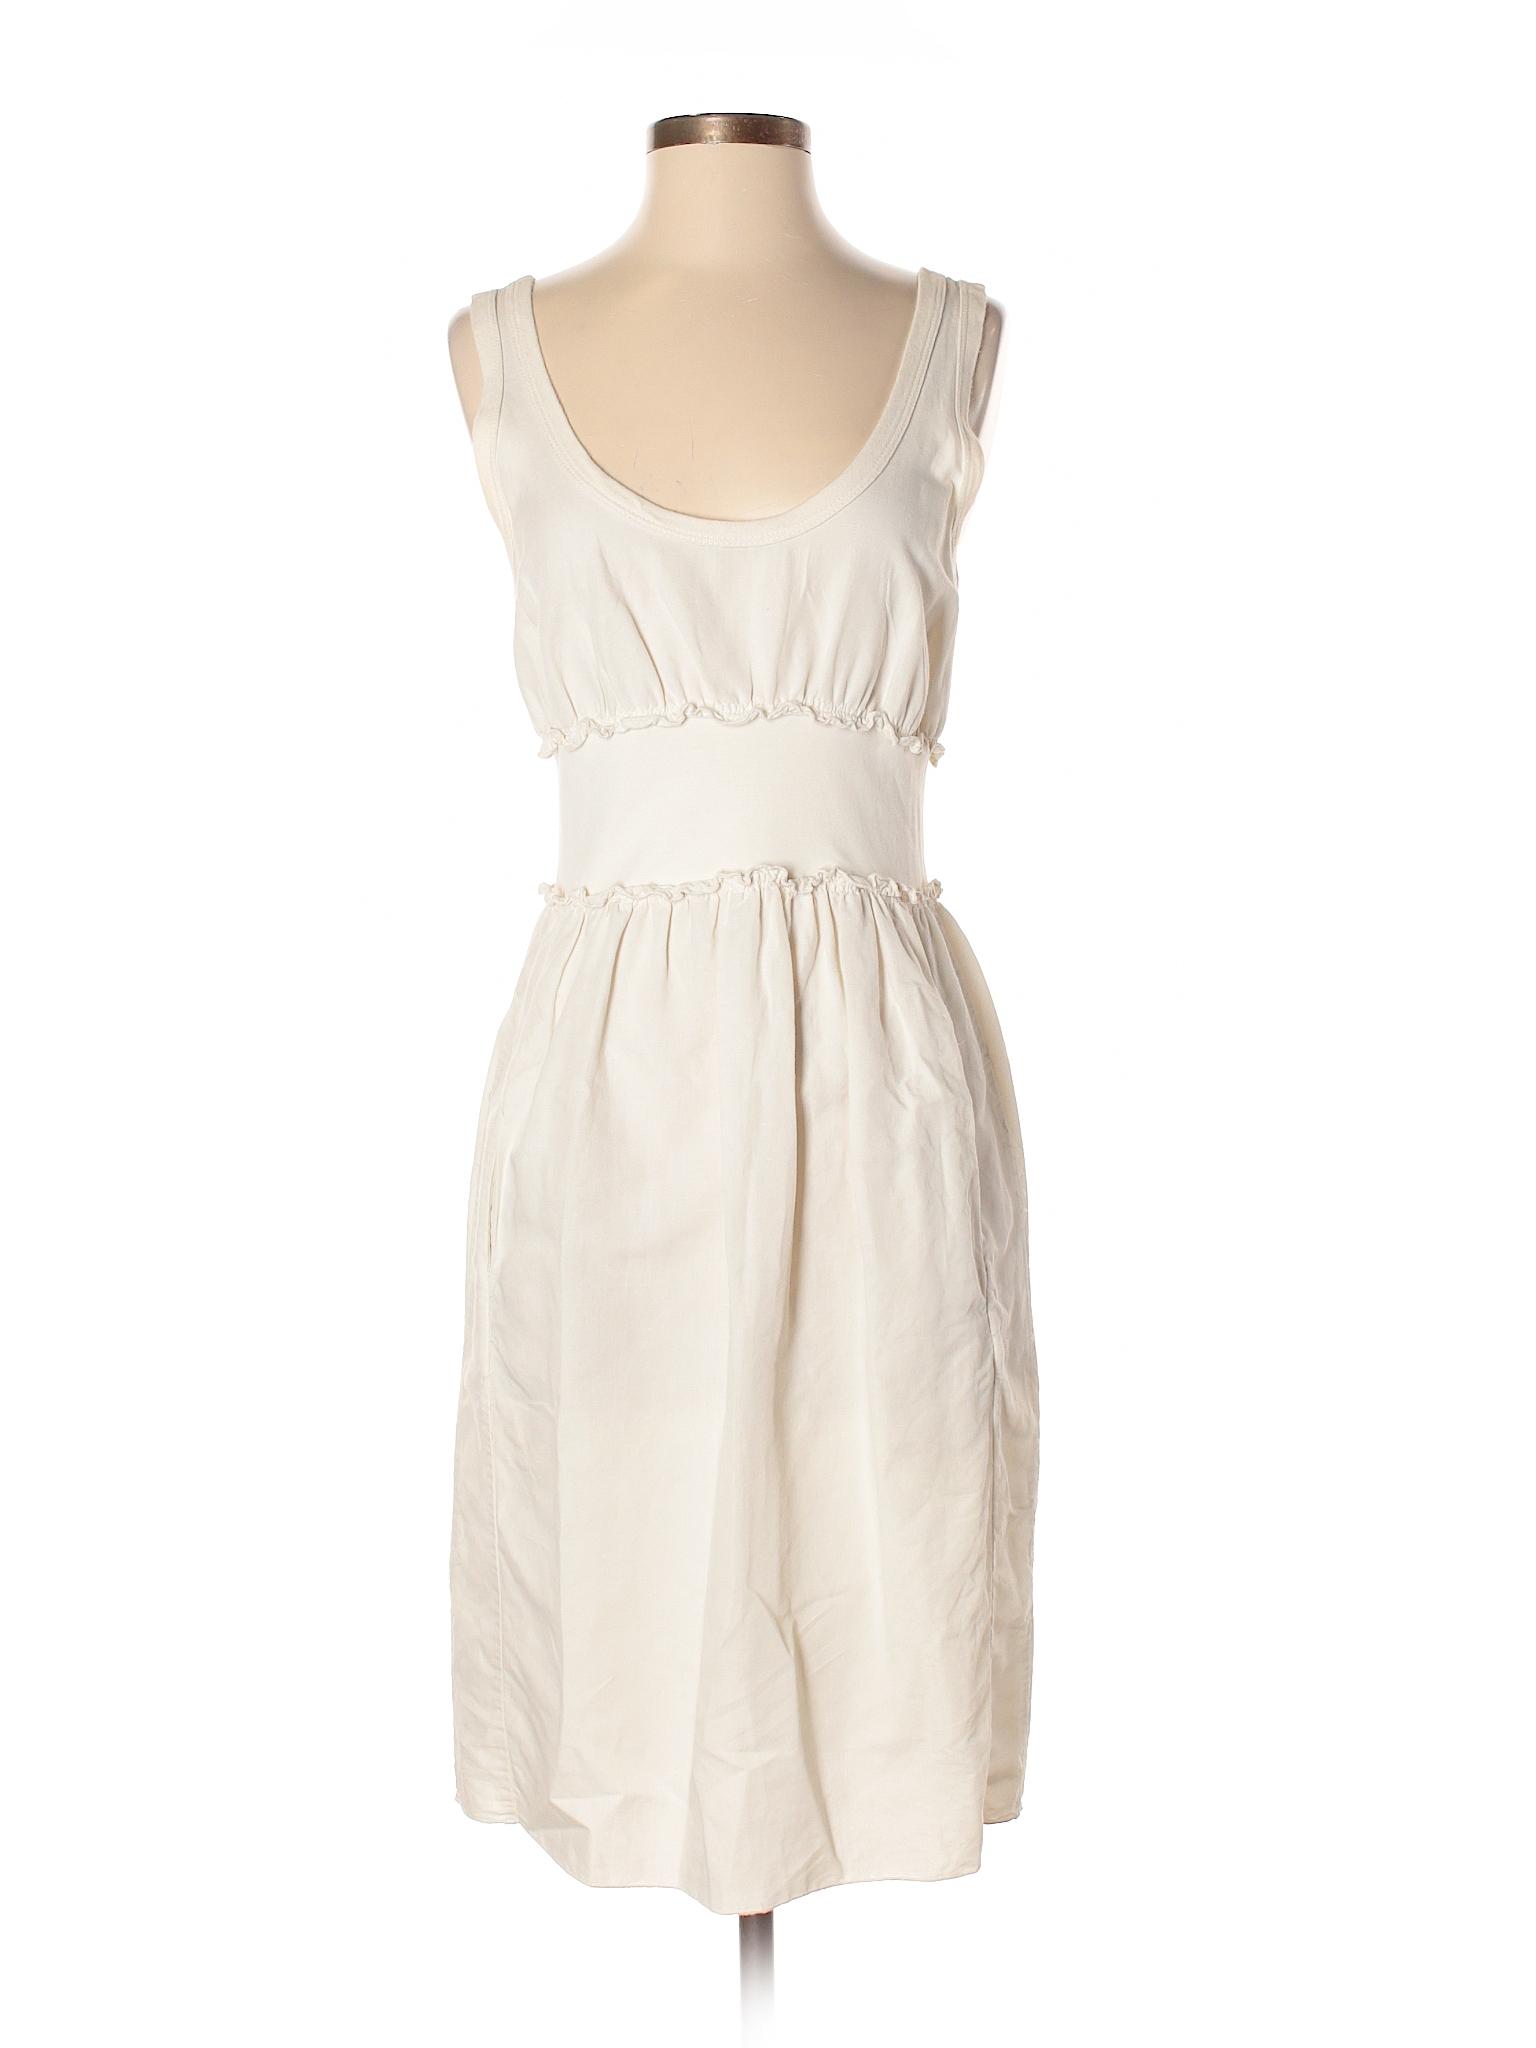 Boutique Winter Casual James Perse Dress rr7dZS